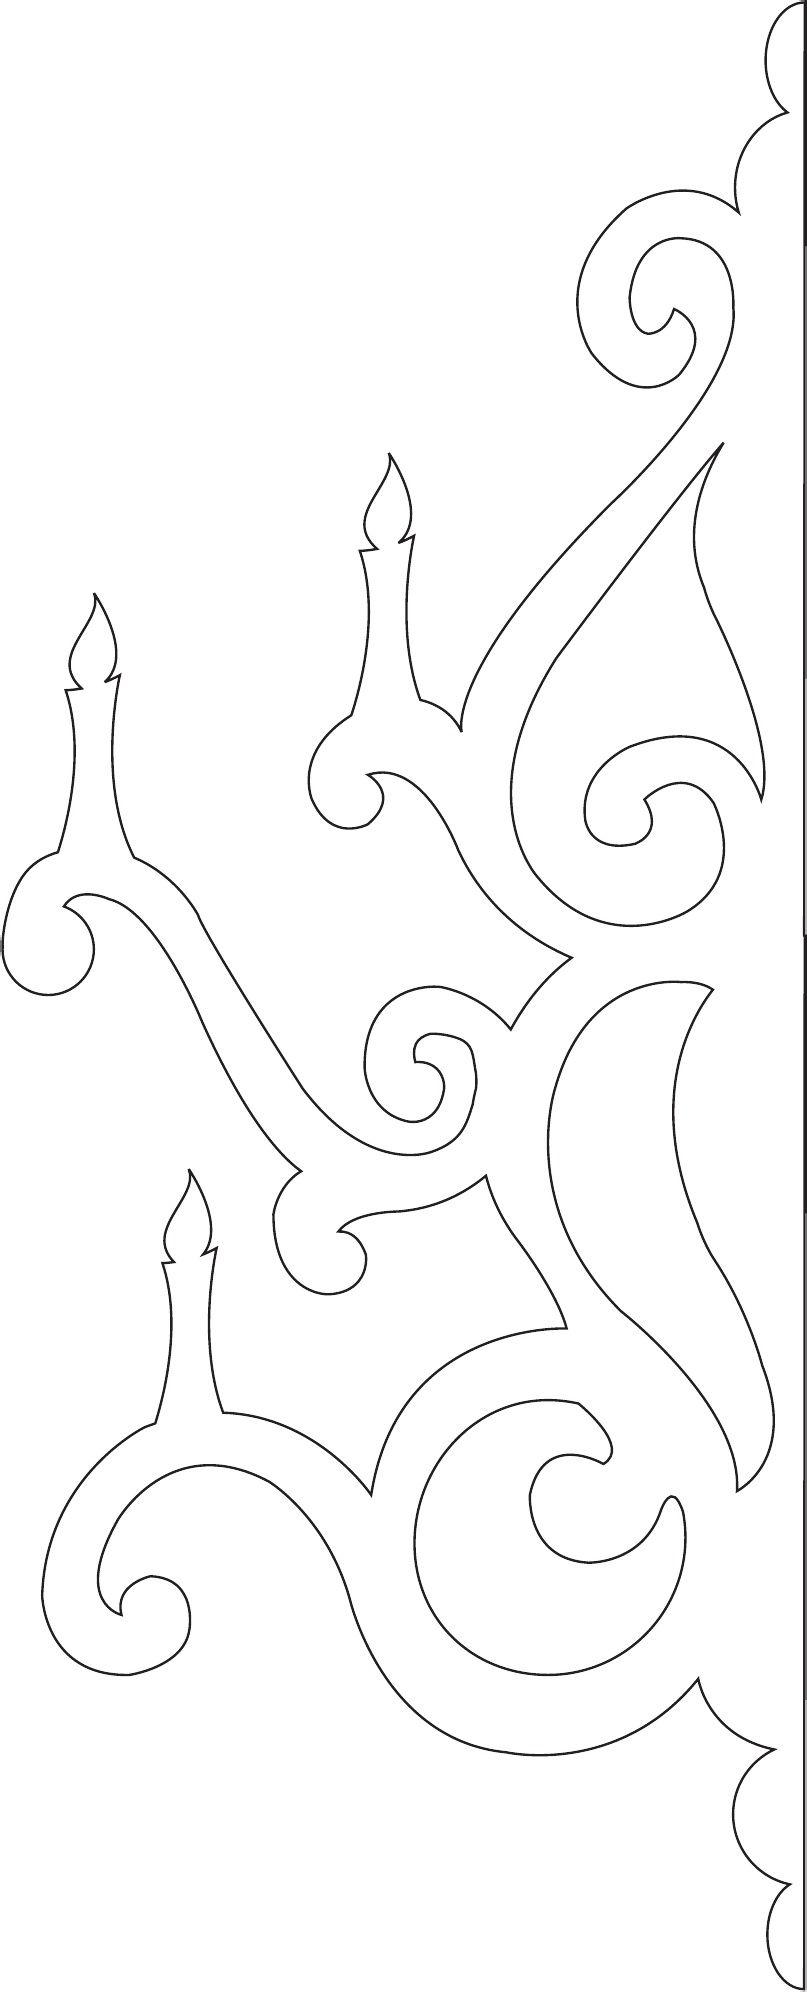 Chandelier Template Cardboard Chandelier Paper Flowers Paper Crafts